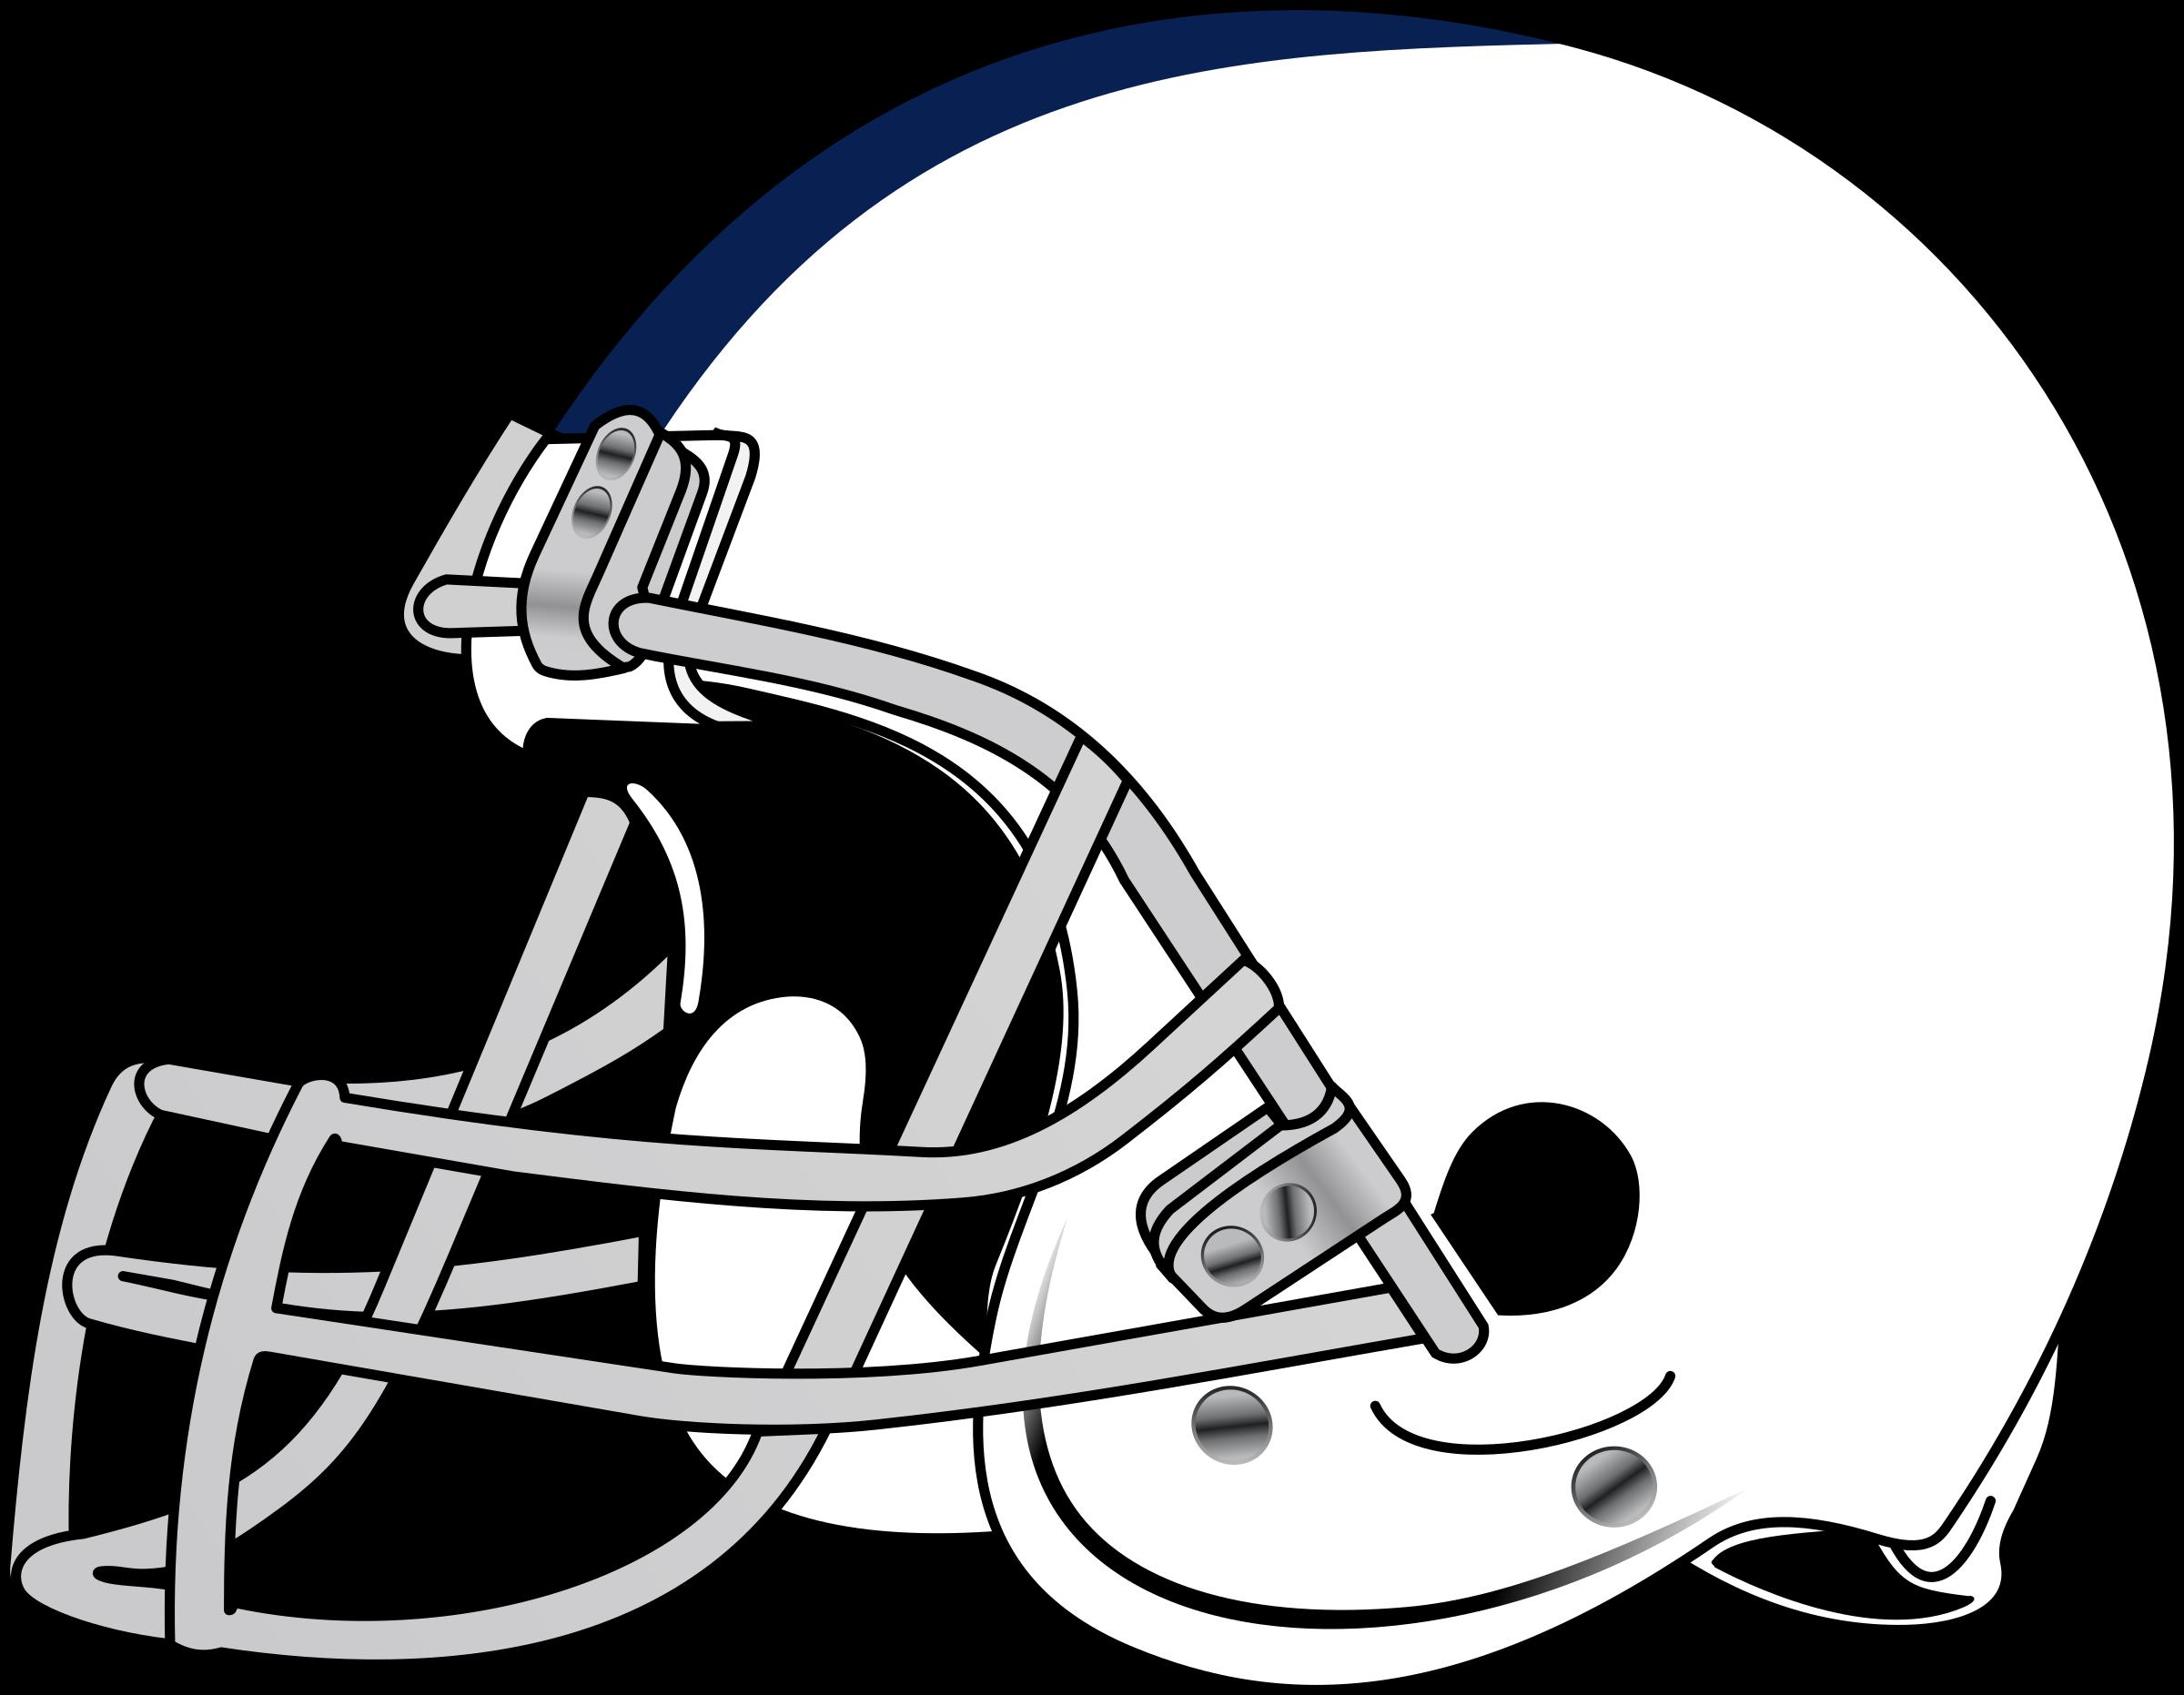 Football helmet clip art free clipart im-Football helmet clip art free clipart image-0